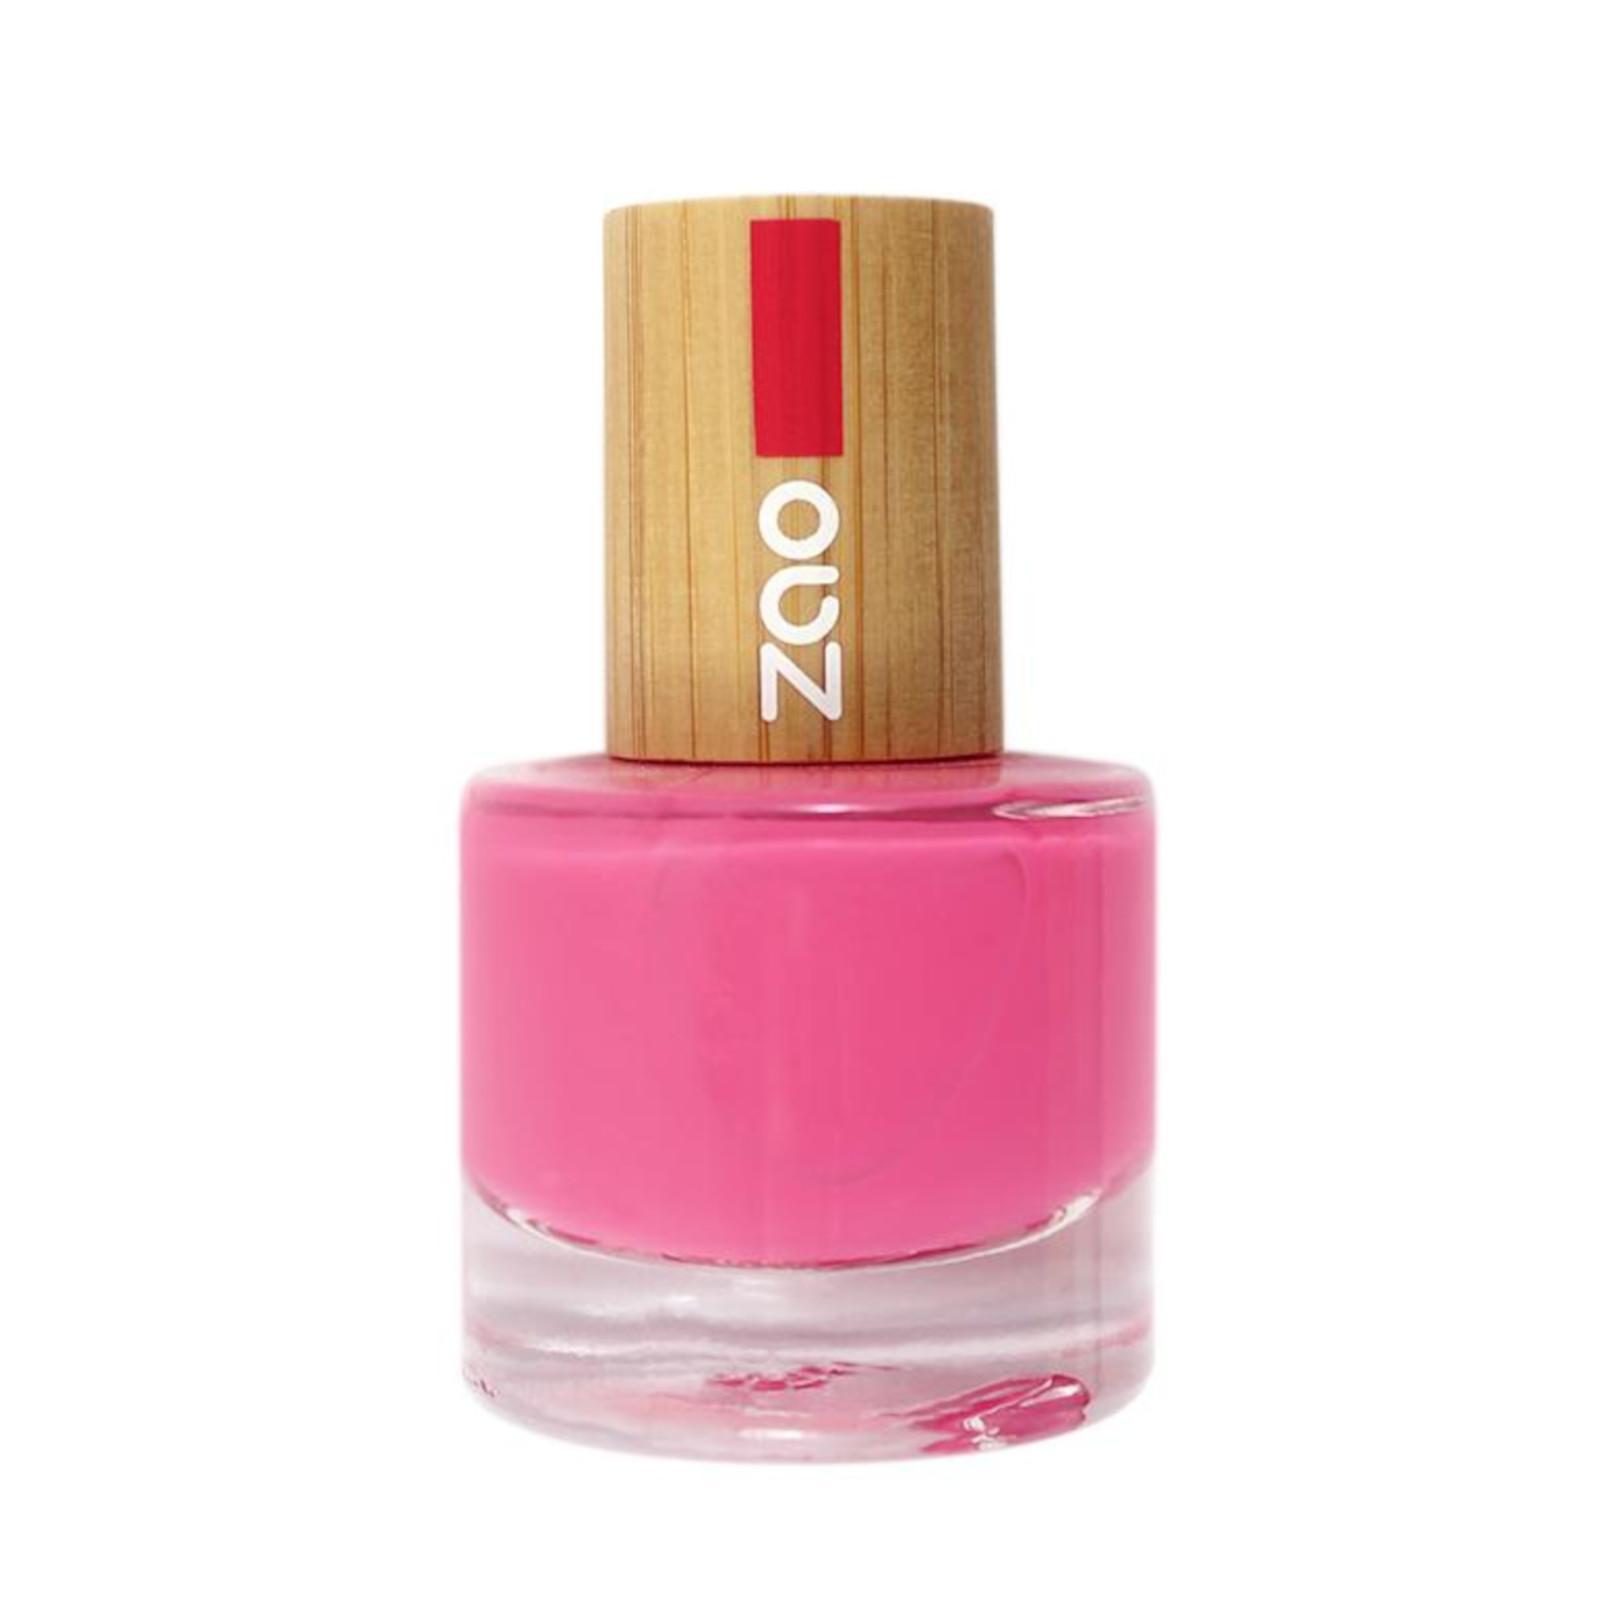 Biooo Cz Zao Lak Na Nehty 657 Fuchsia Pink 8 Ml